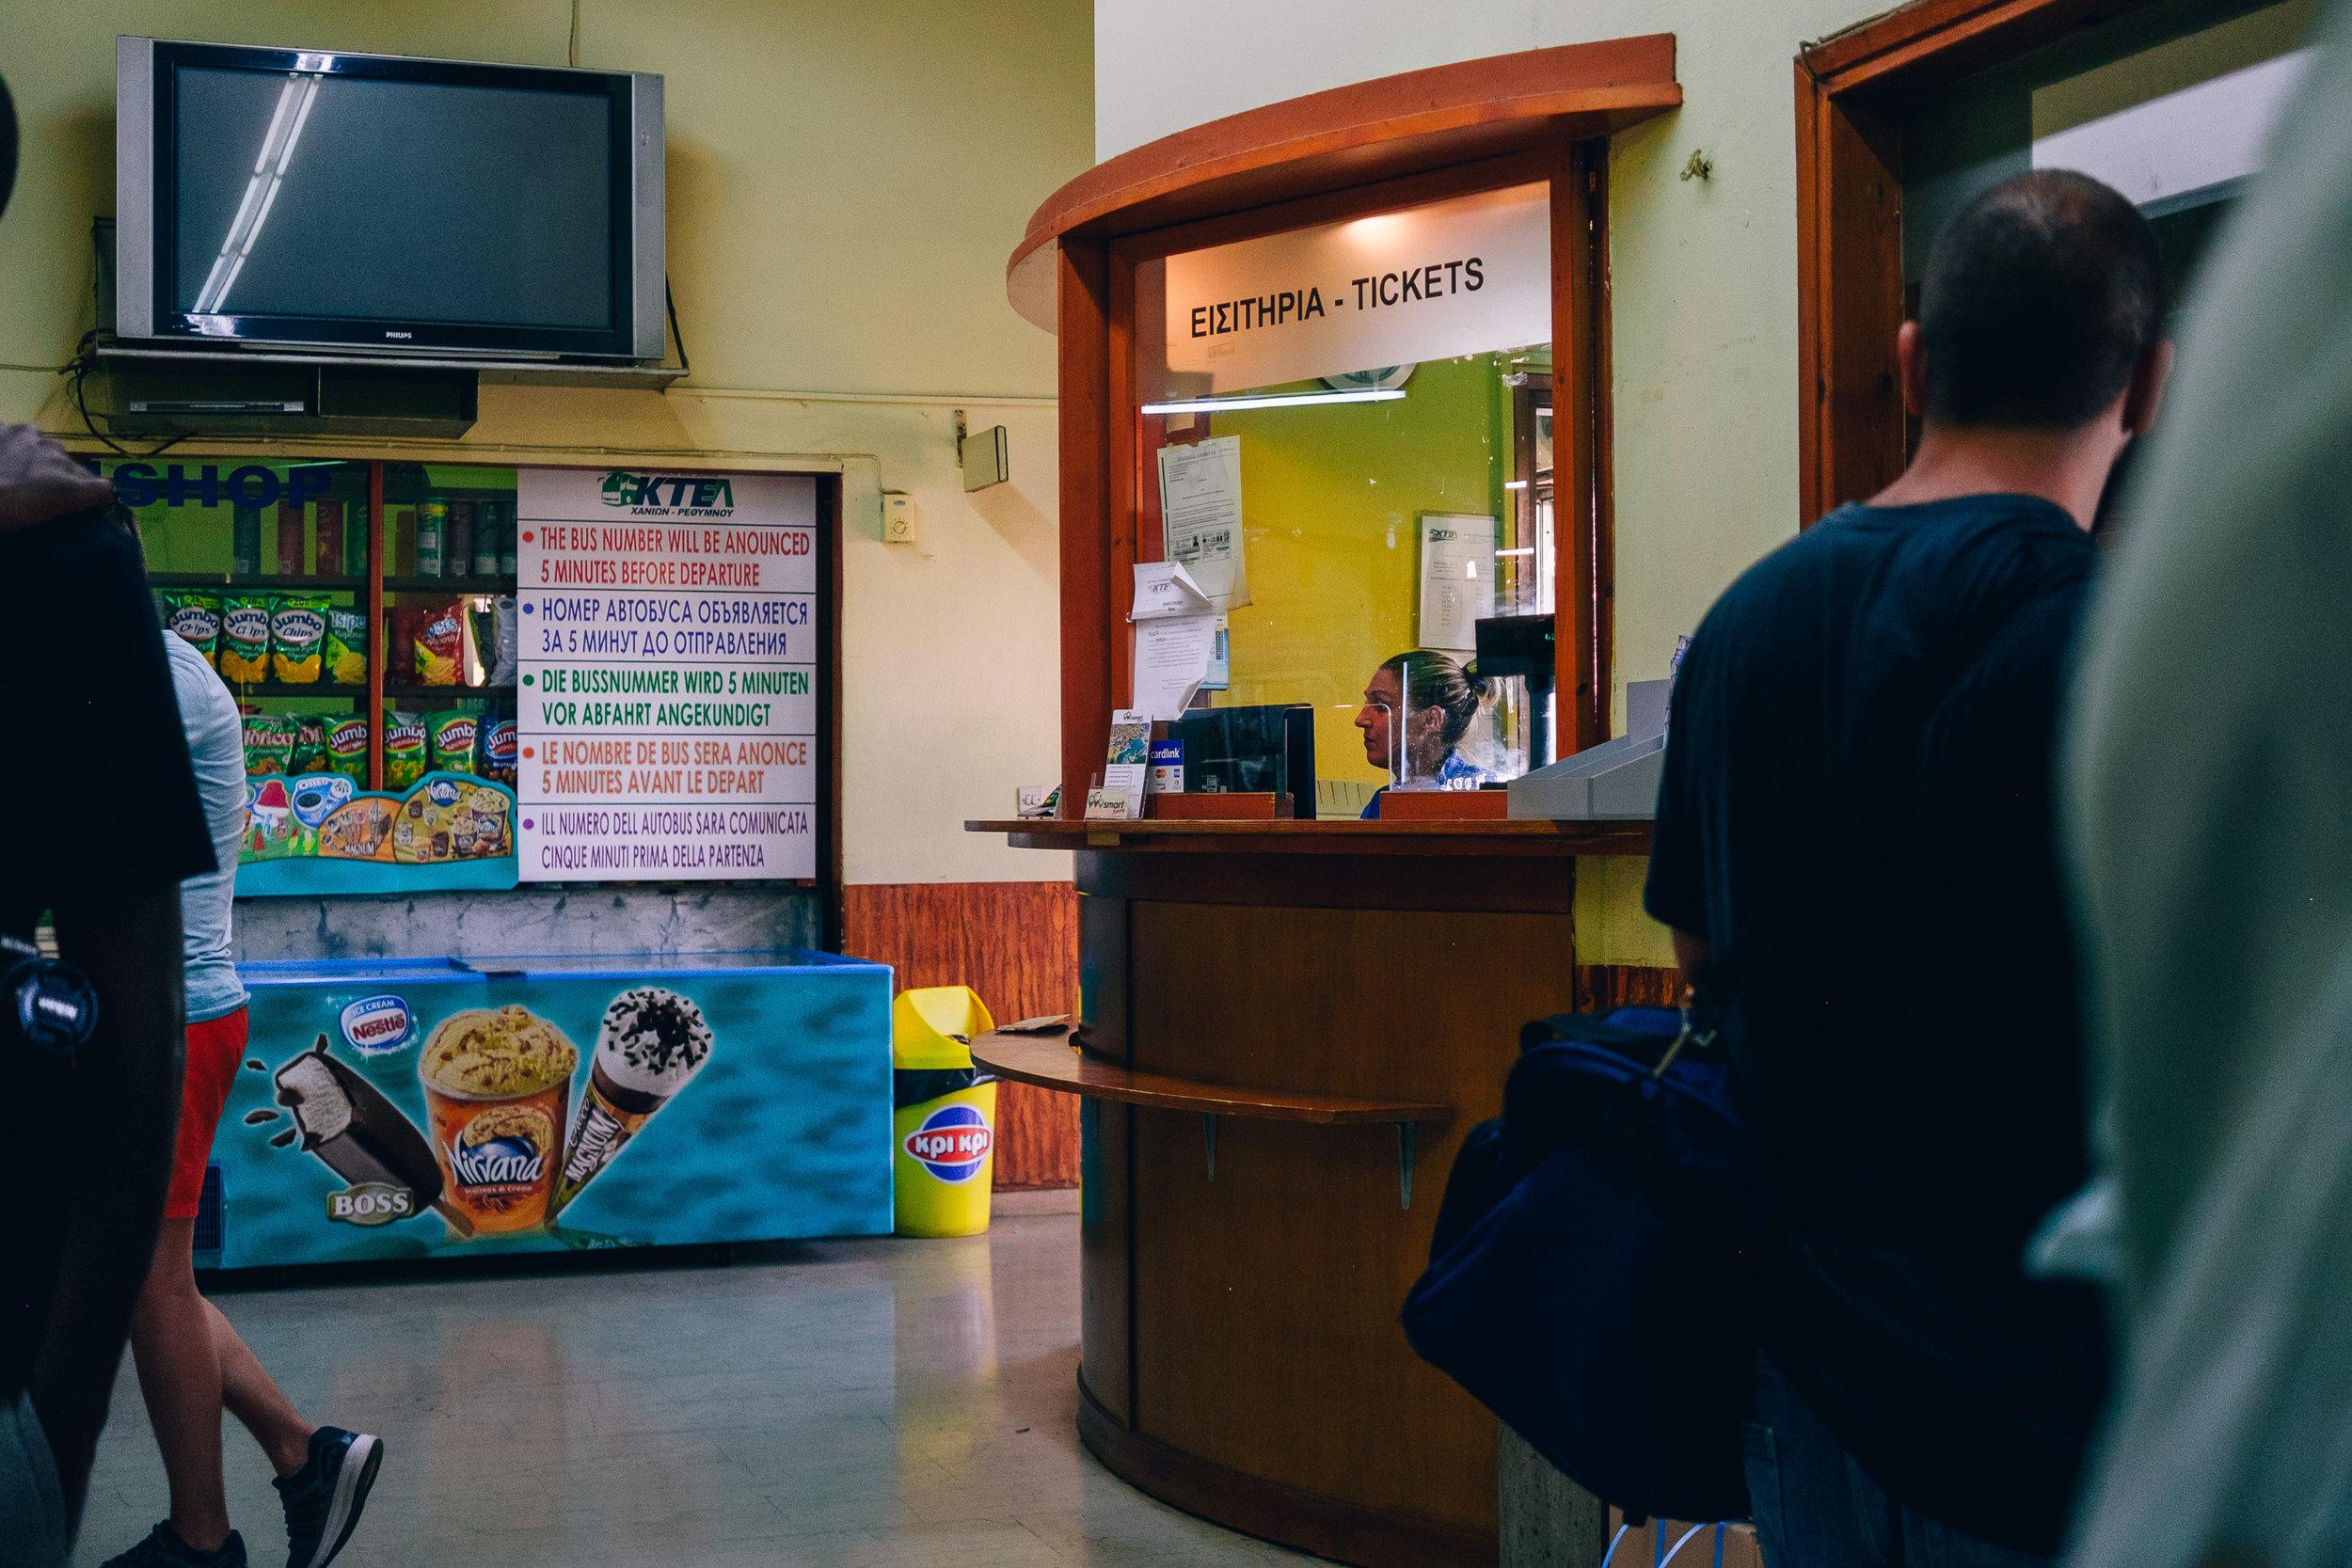 Rethymno bus station